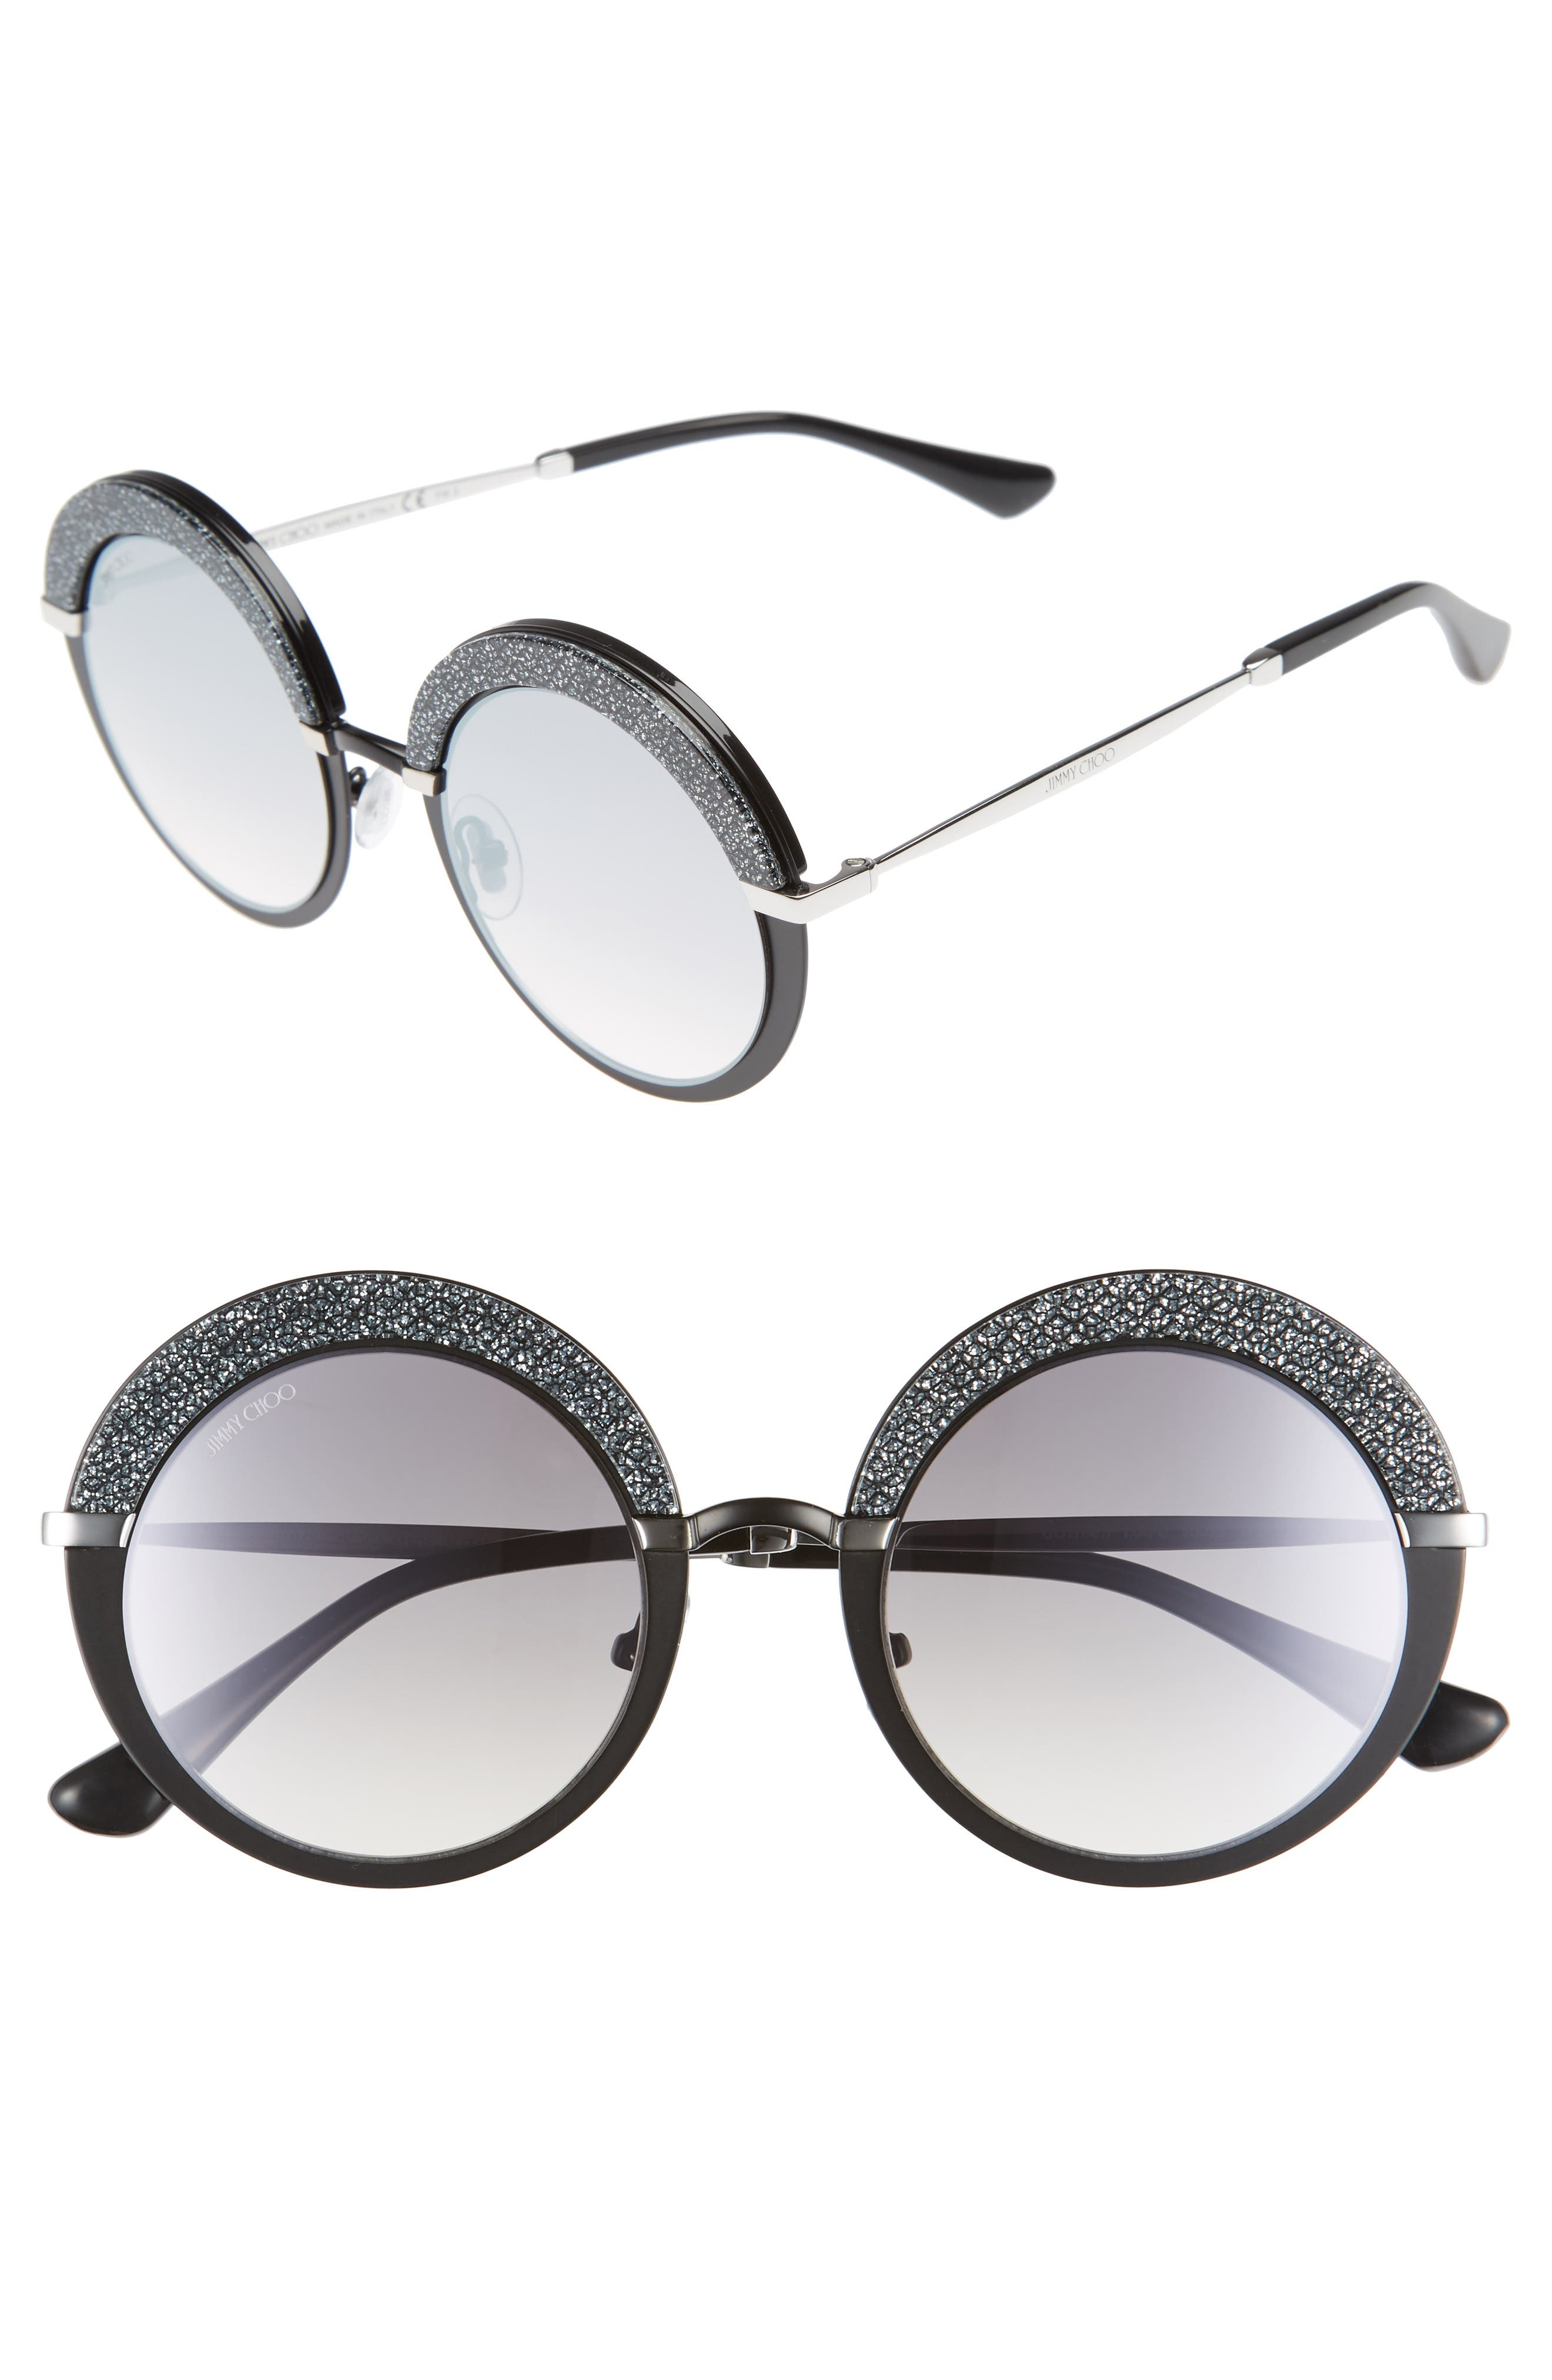 Main Image - Jimmy Choo Gotha/S 50mm Round Sunglasses